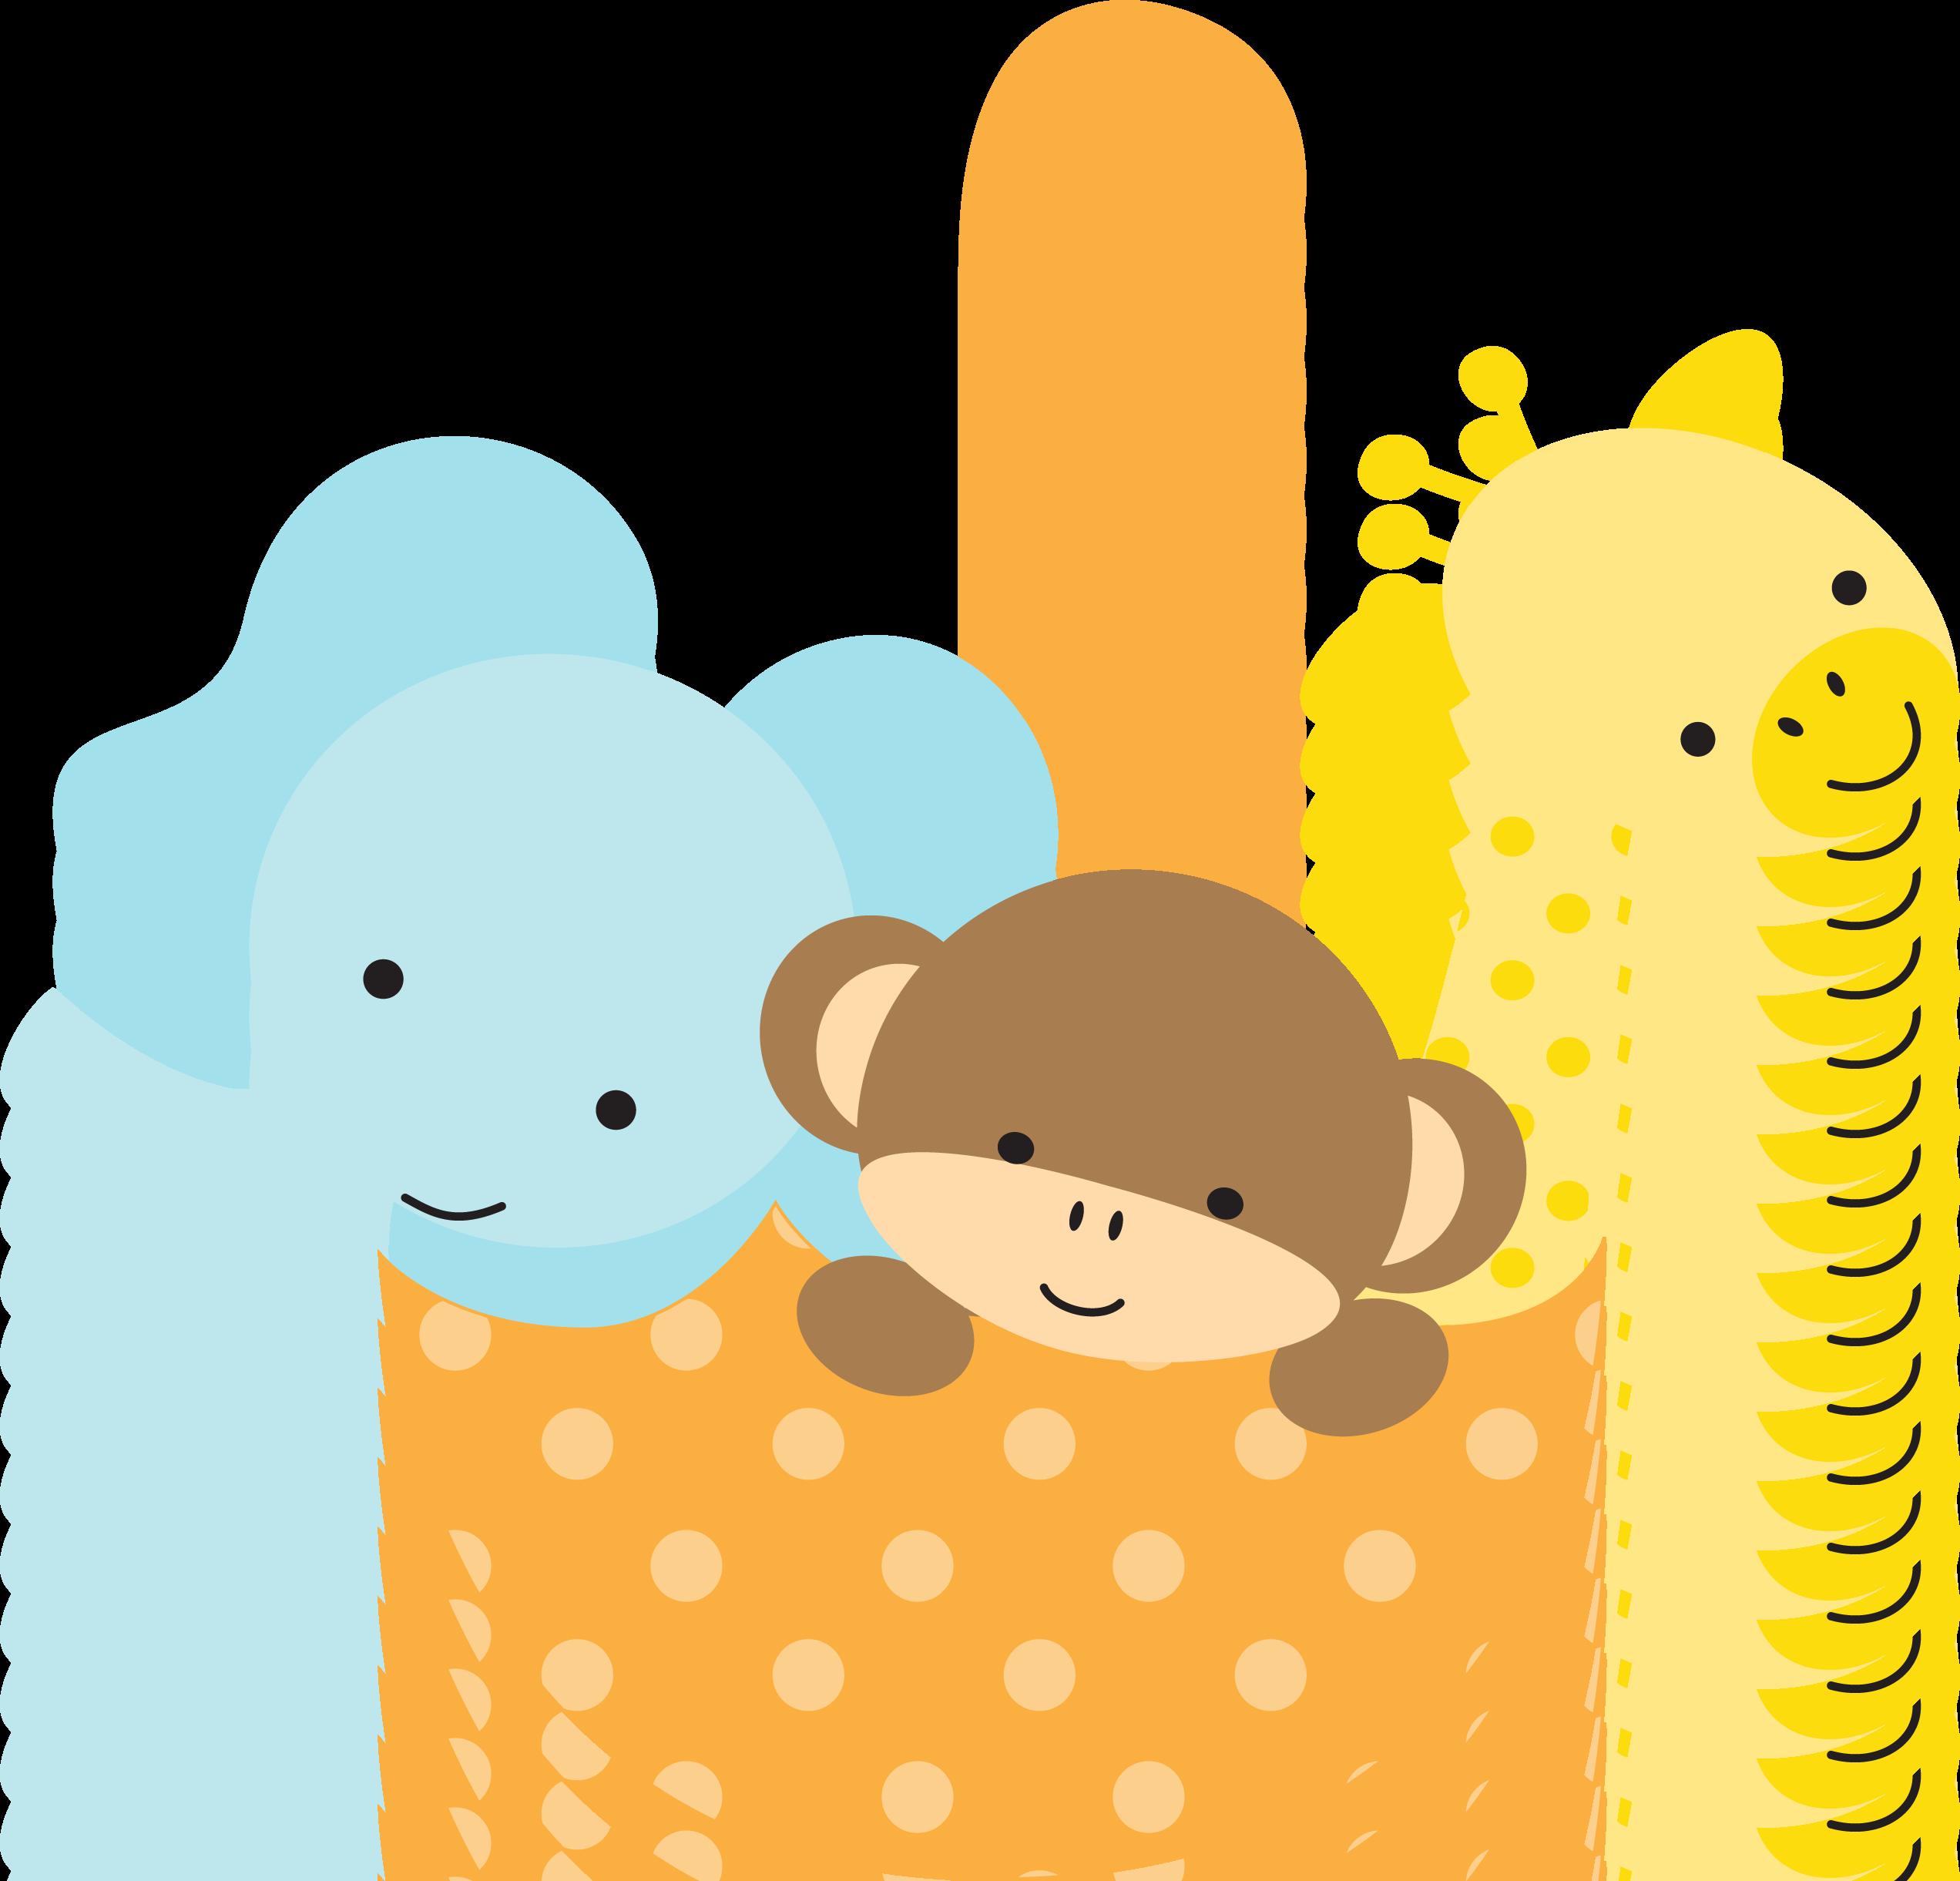 Clipart giraffe baby shower. Photo by daniellemoraesfalcao minus